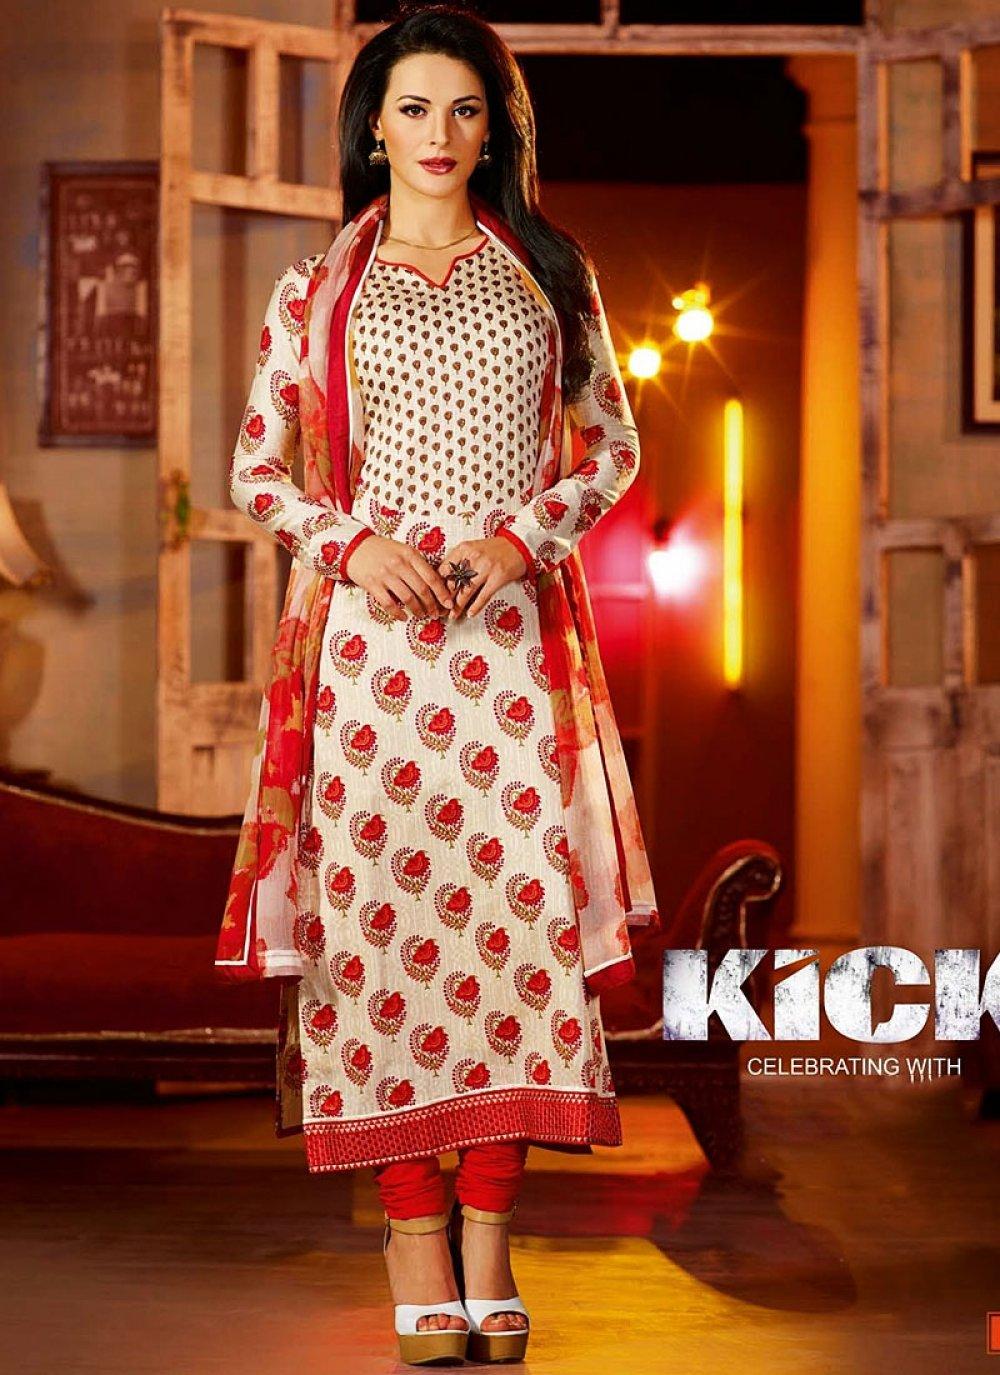 Off White Cotton Flower Print Kick Movie Churidar Suit